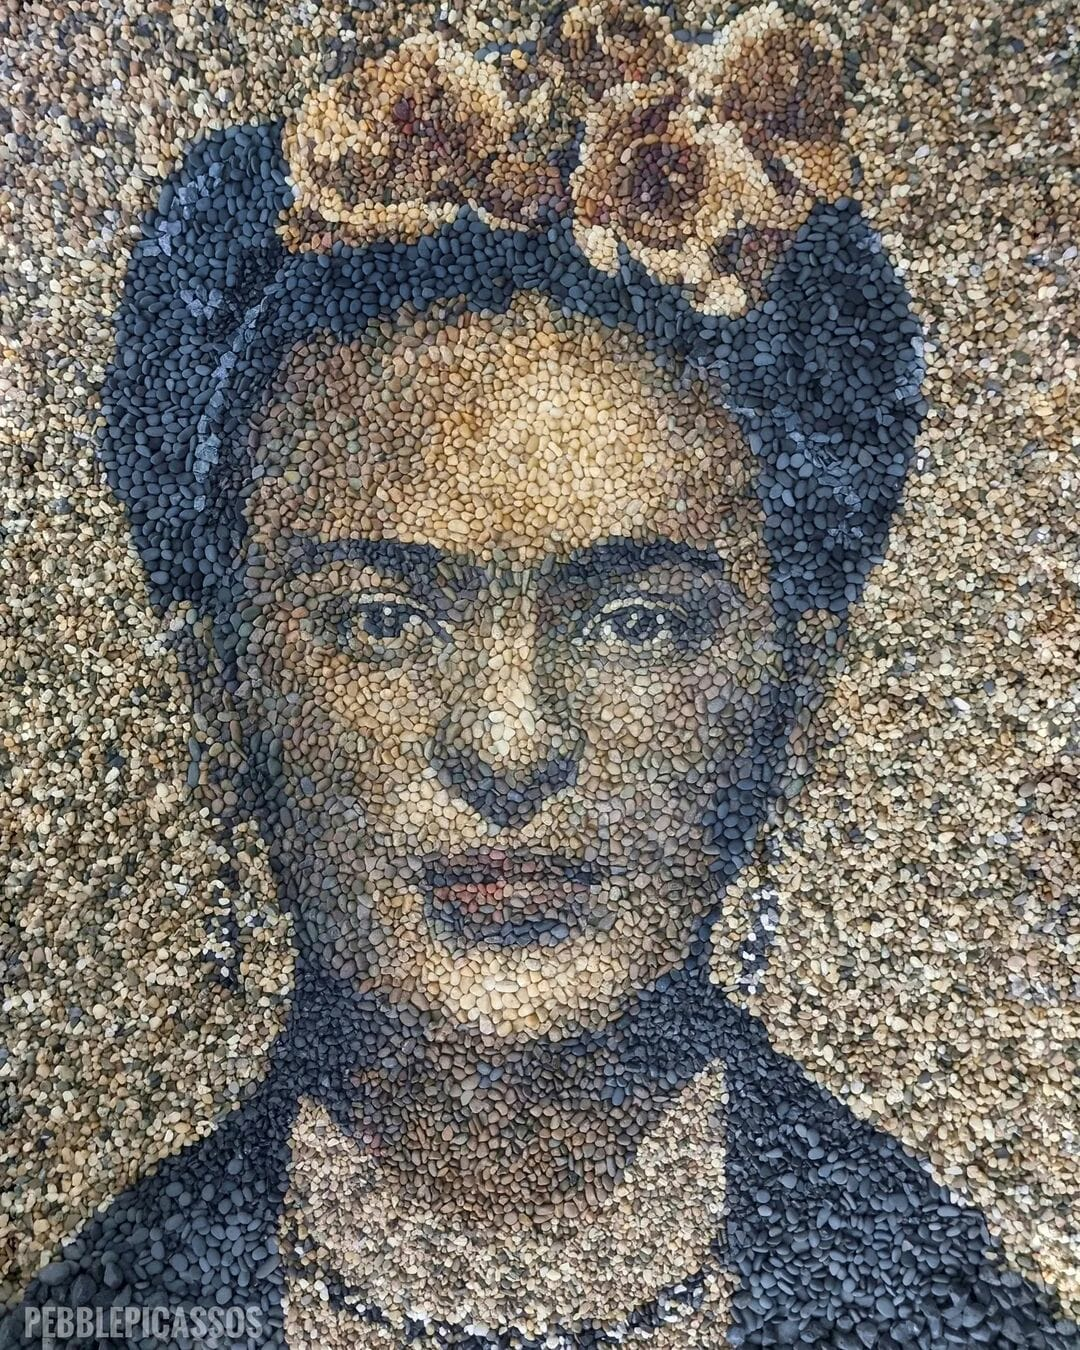 Frida Kahlo 2021 by Justin Bateman